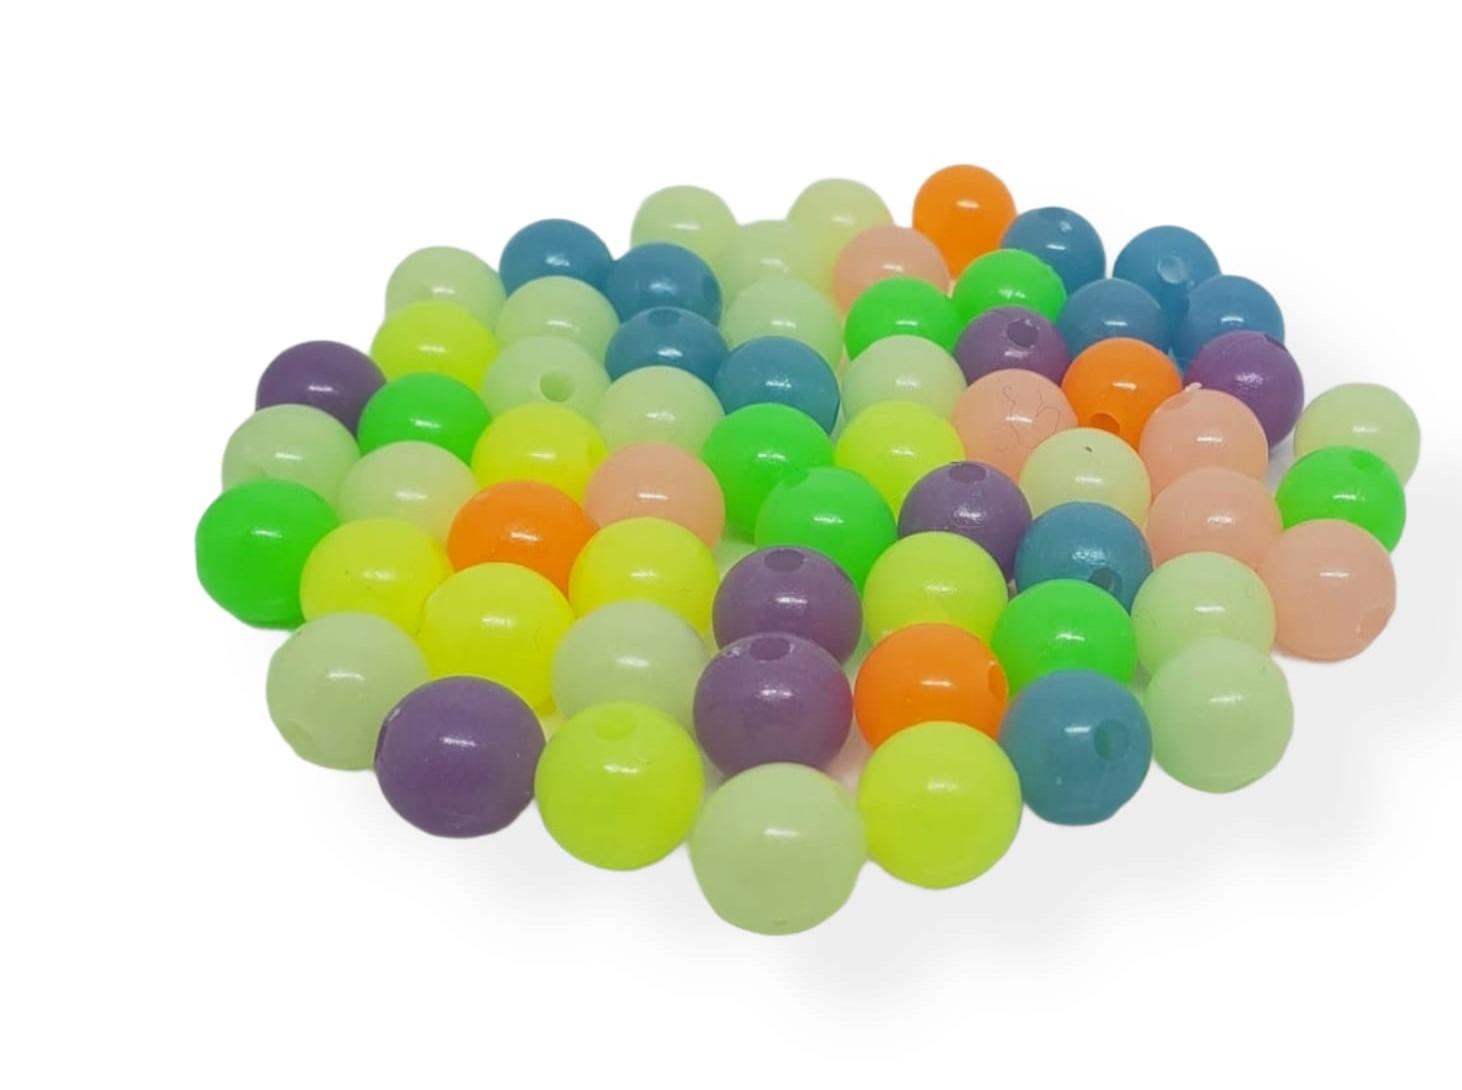 Contas Plastica Colorida -  Bola Neon claro